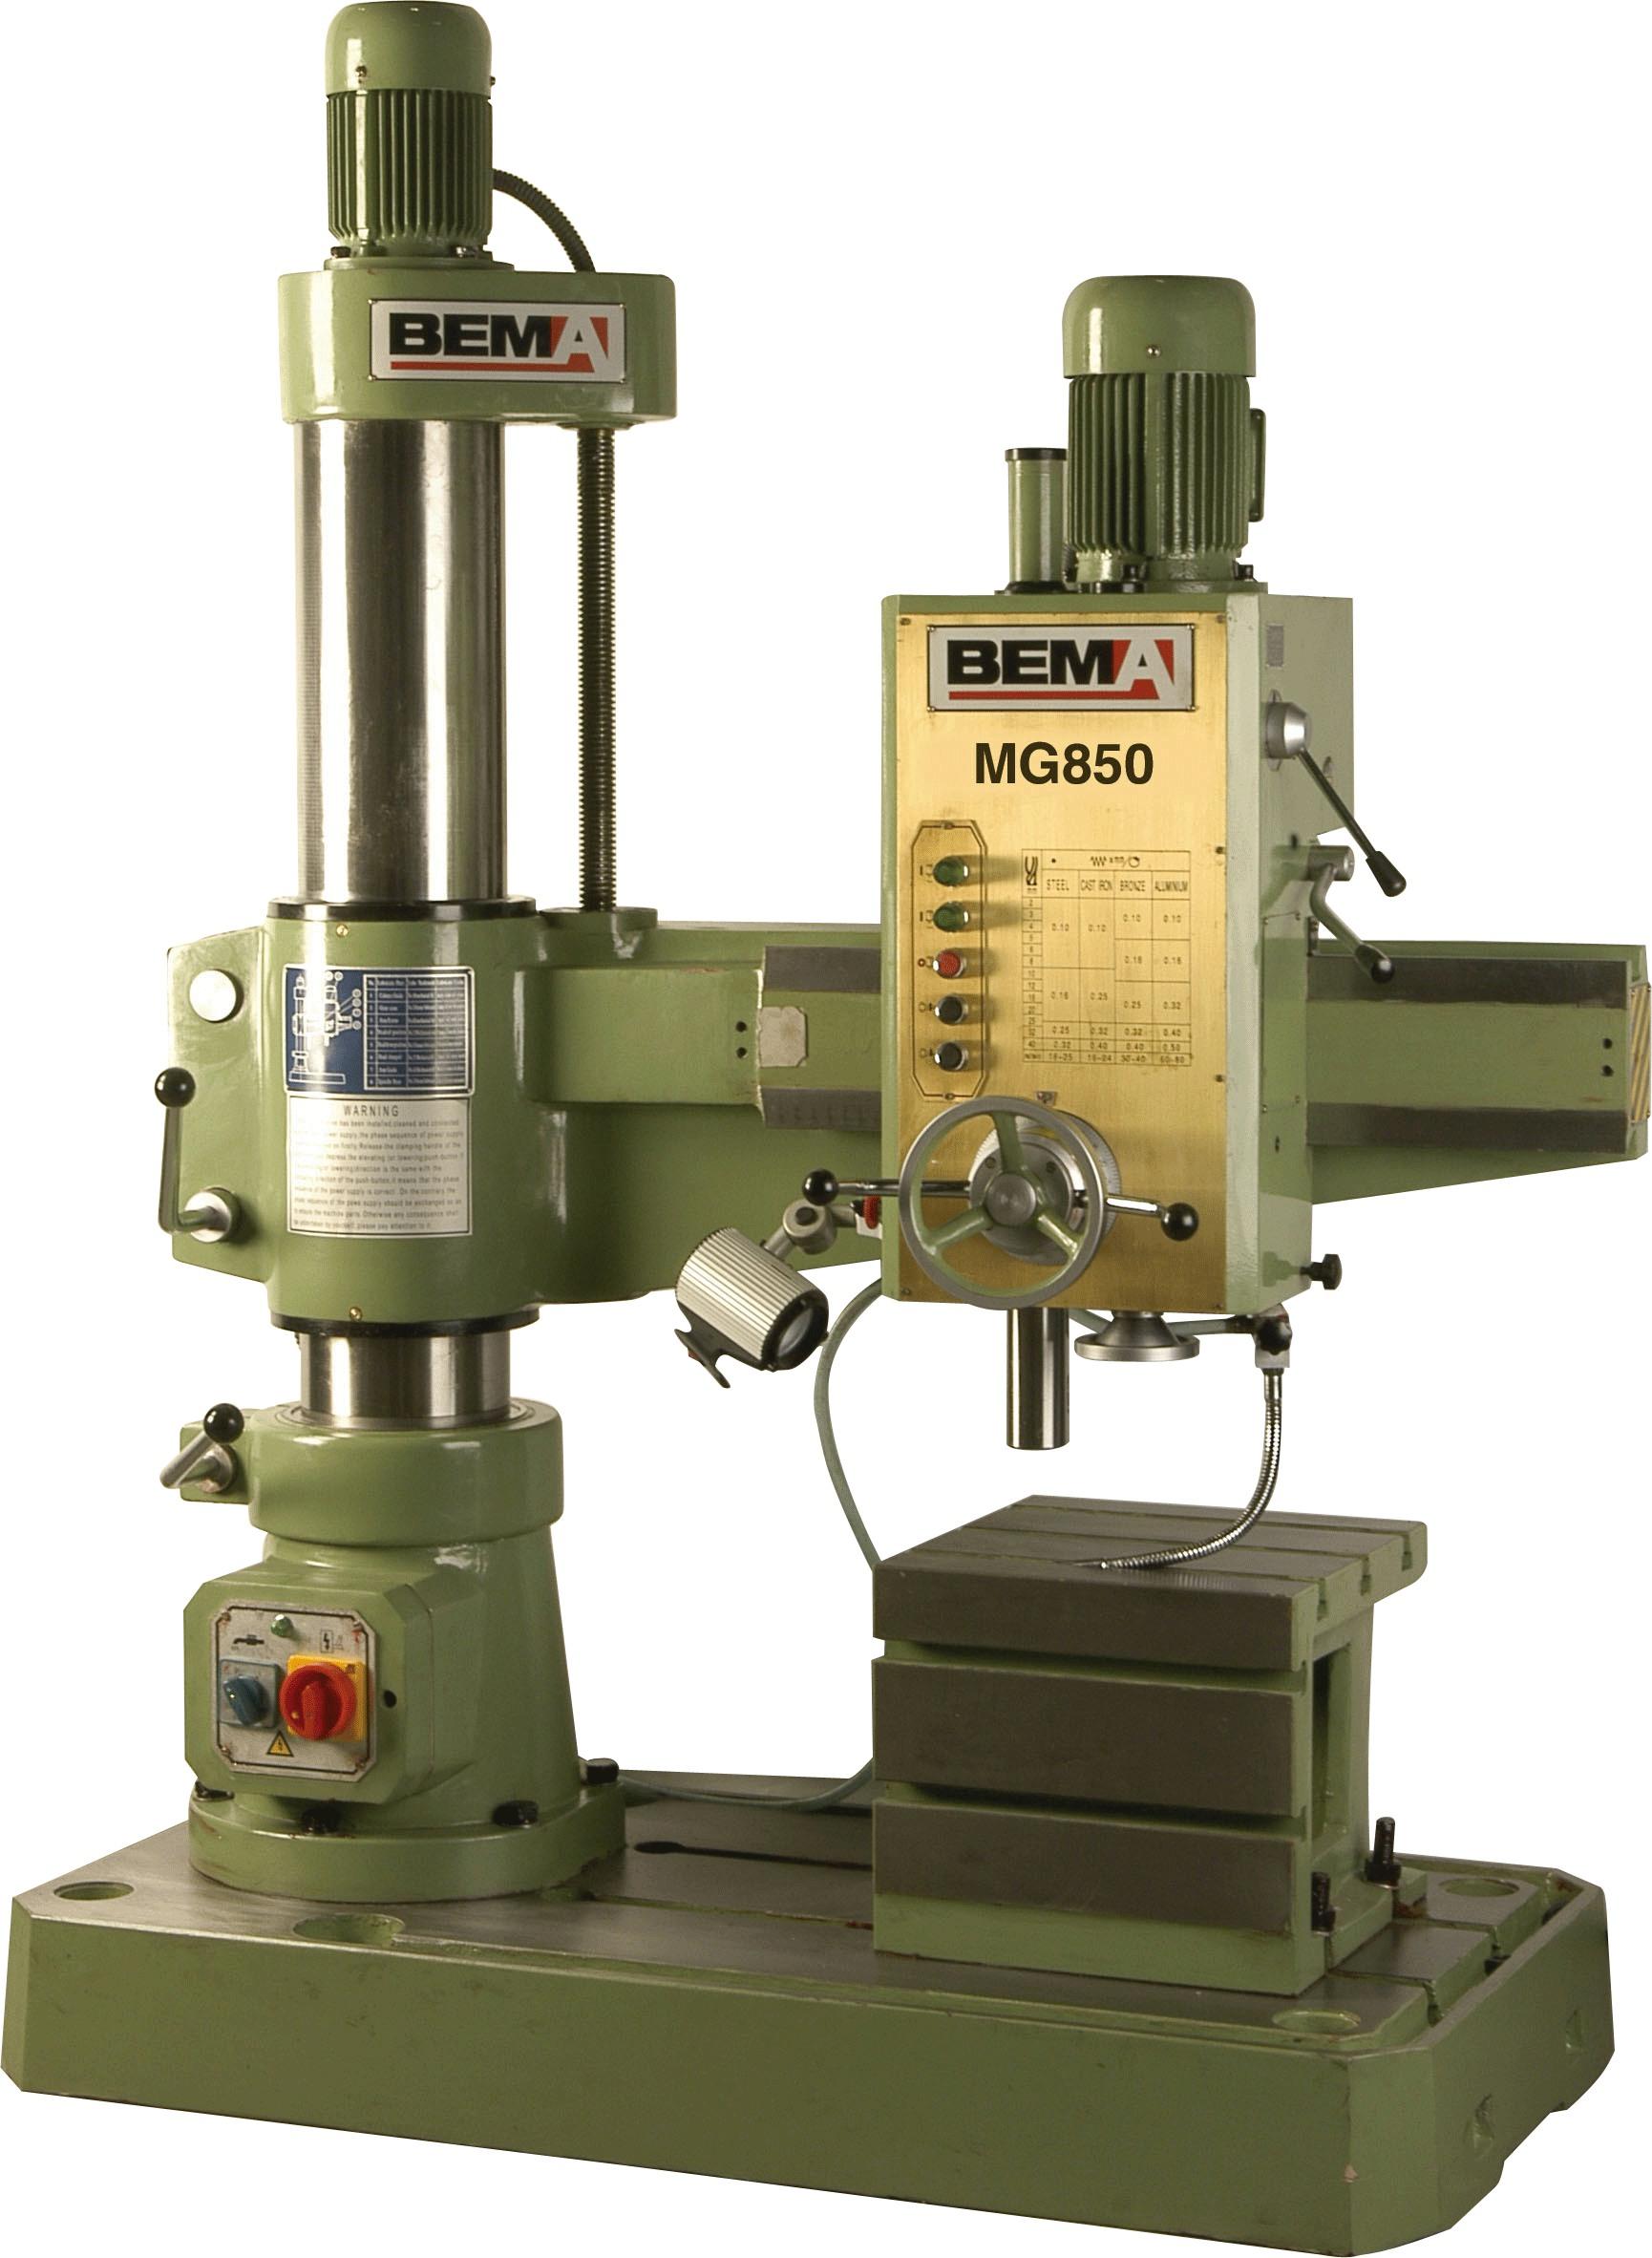 Bema Radial Arm Drills